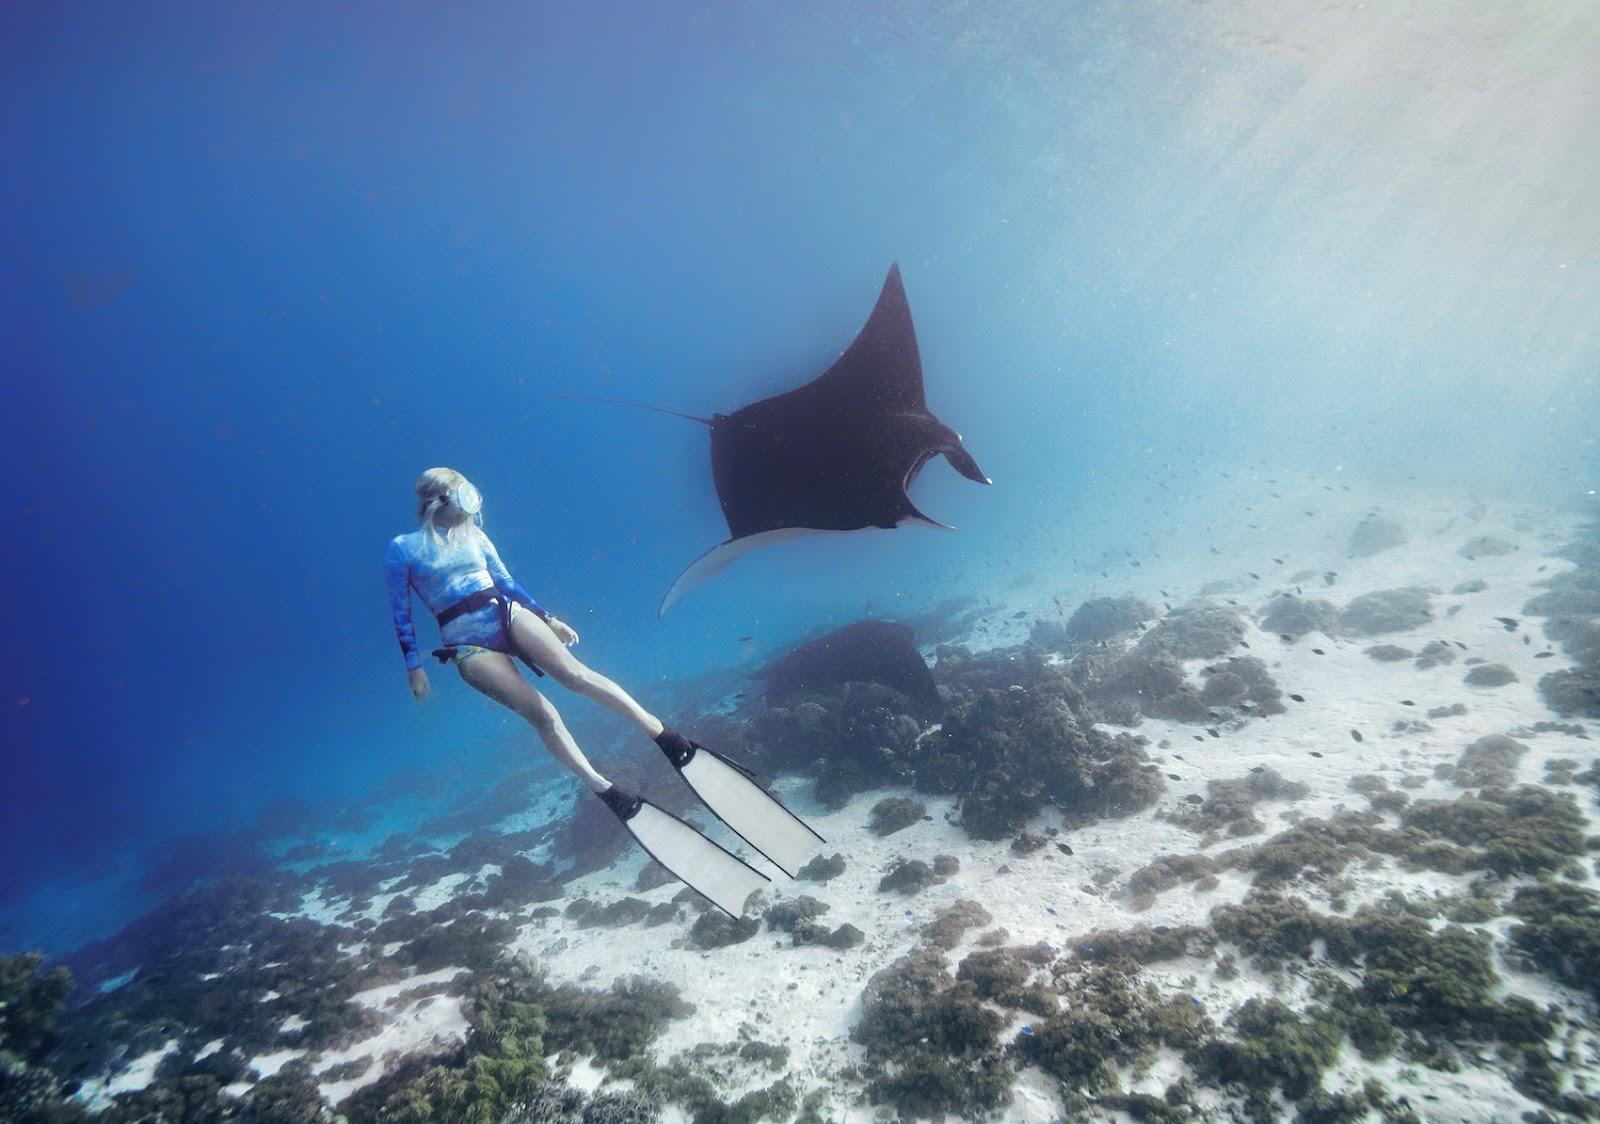 "<a href=""http://mataram.info/things-to-do-in-bali/visitindonesia-banda-marine-life-the-paradise-of-diving-topographic-point-inward-fundamental-maluku/"">Indonesia</a>best destinations : Best Swimming Alongside Manta Rays: Komodo National Park"